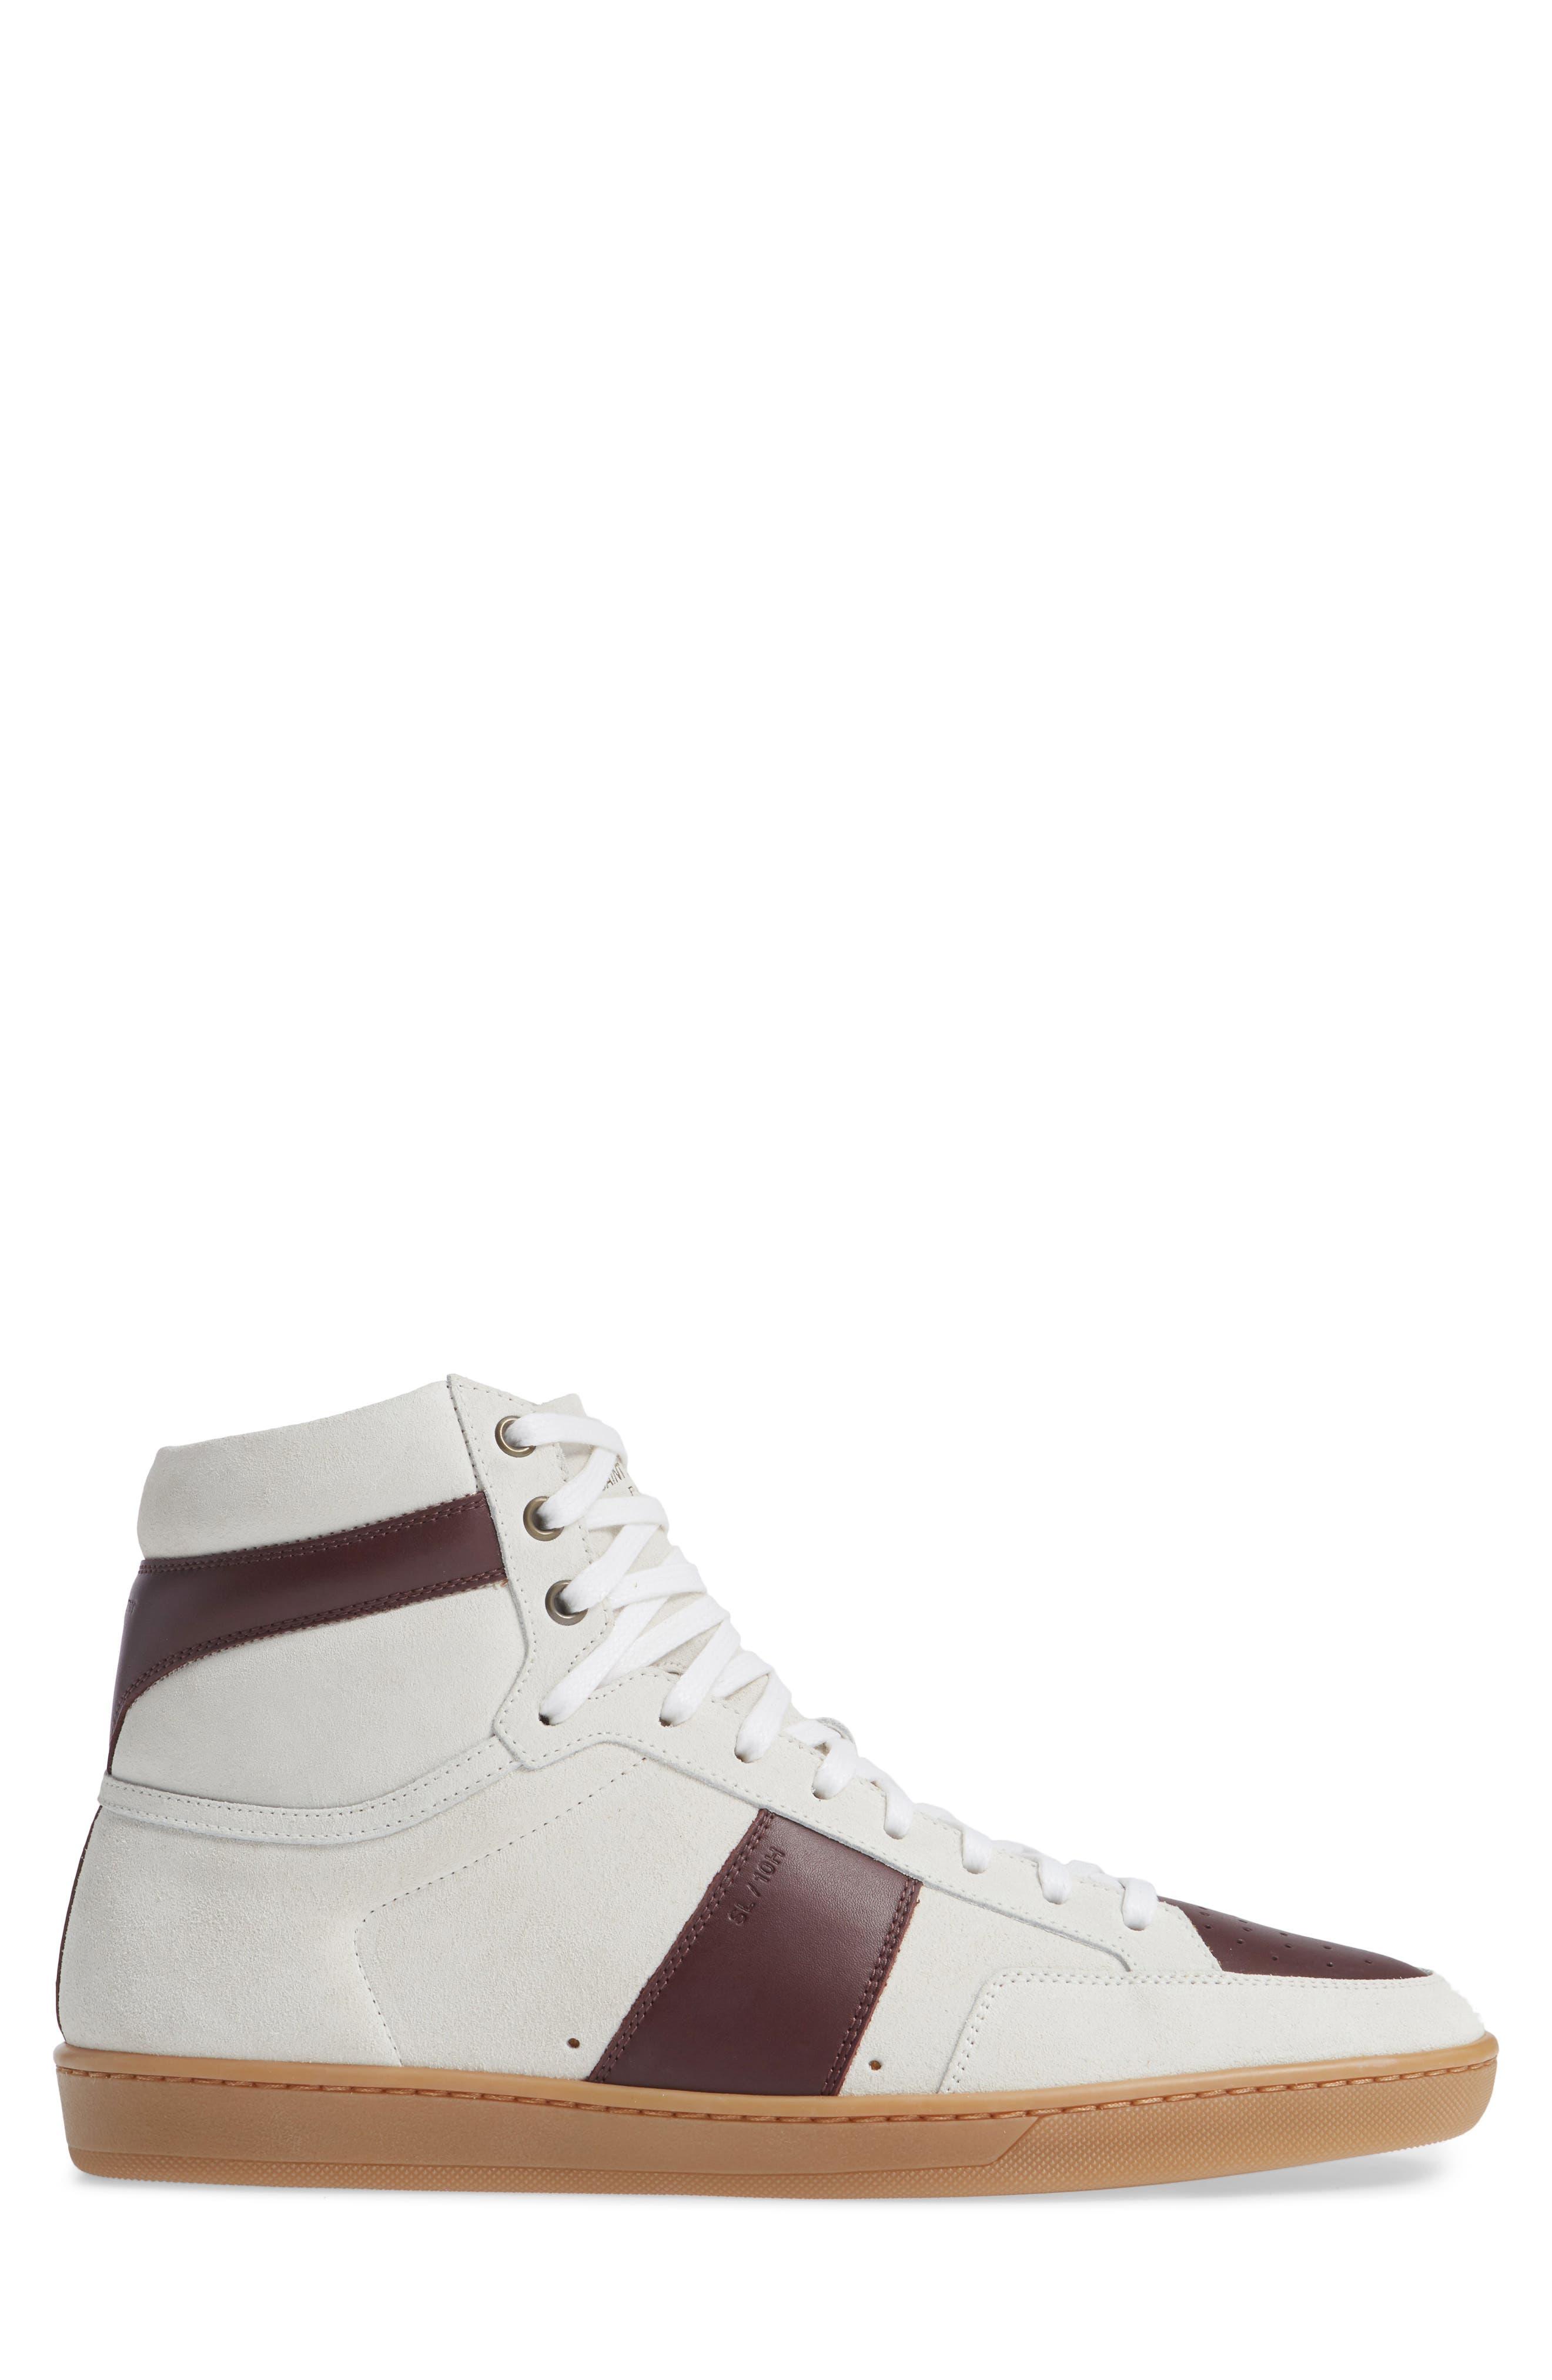 SL/10H Signature Court Classic High-Top Sneaker,                             Alternate thumbnail 6, color,                             Milk/ Barolo